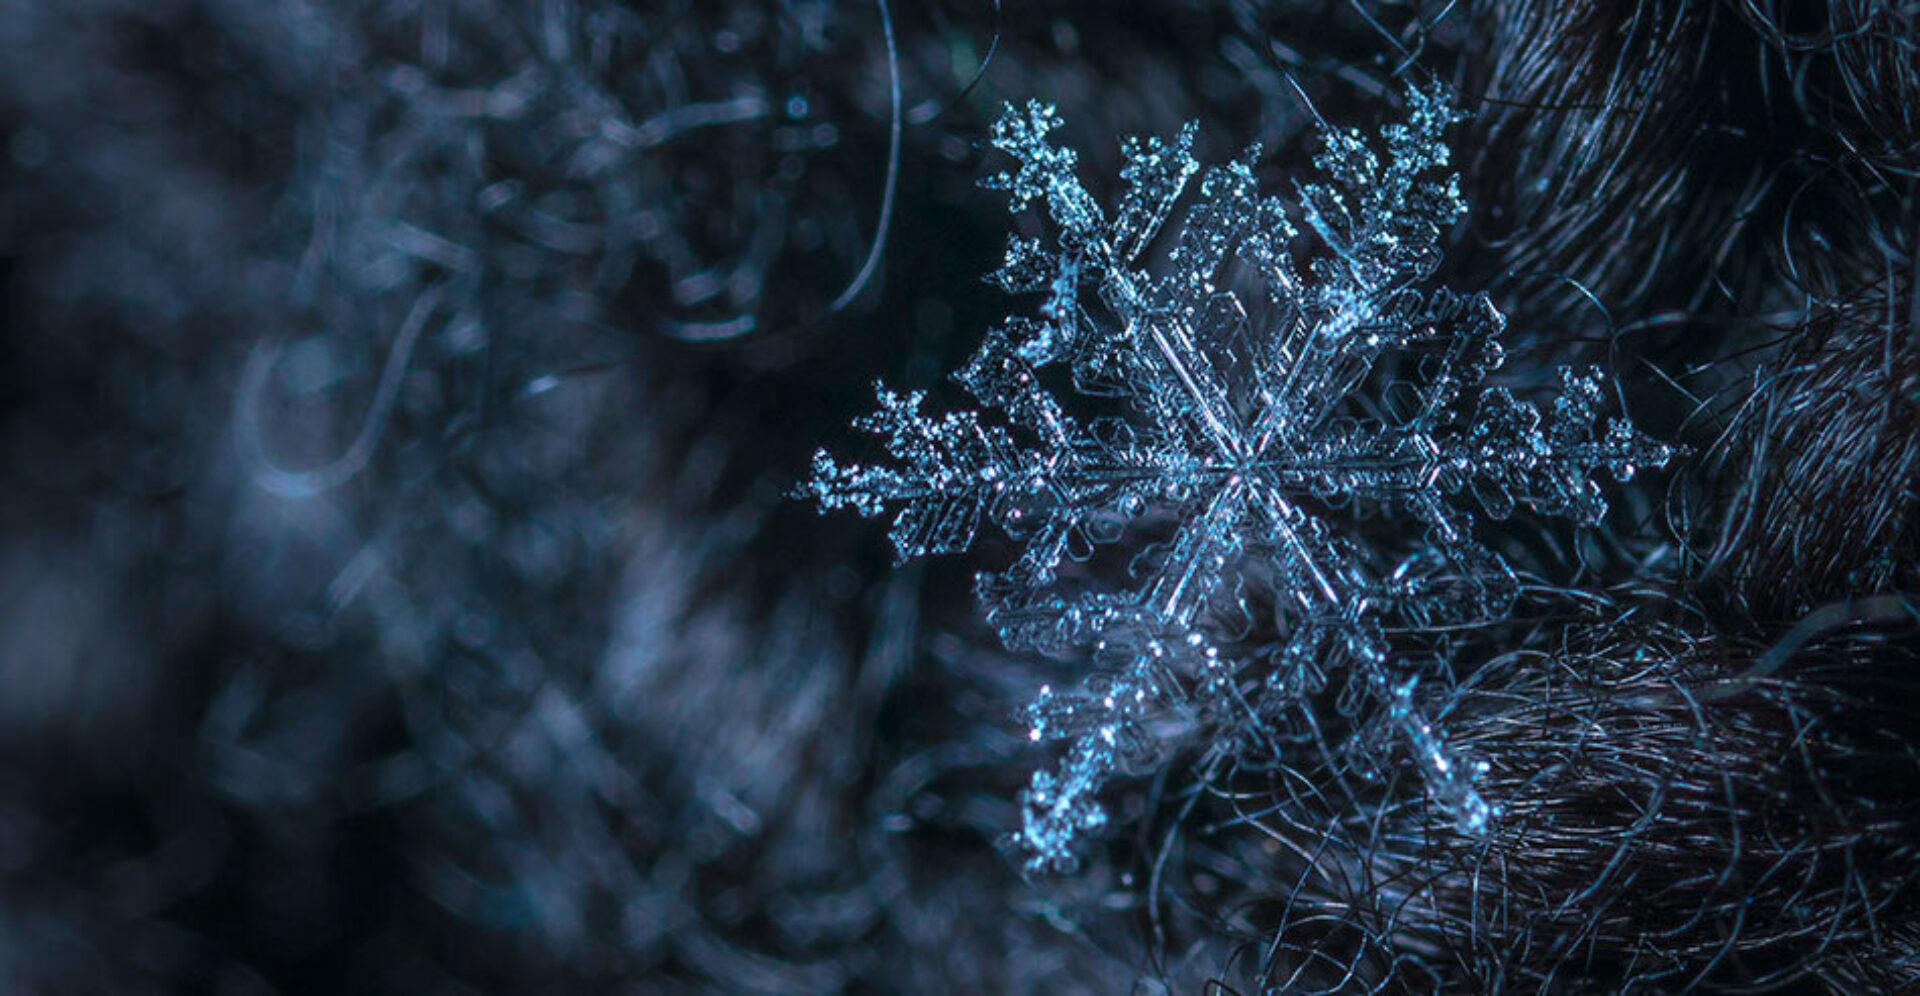 Midwinter (21 december) - De kortste dag, de langste nacht